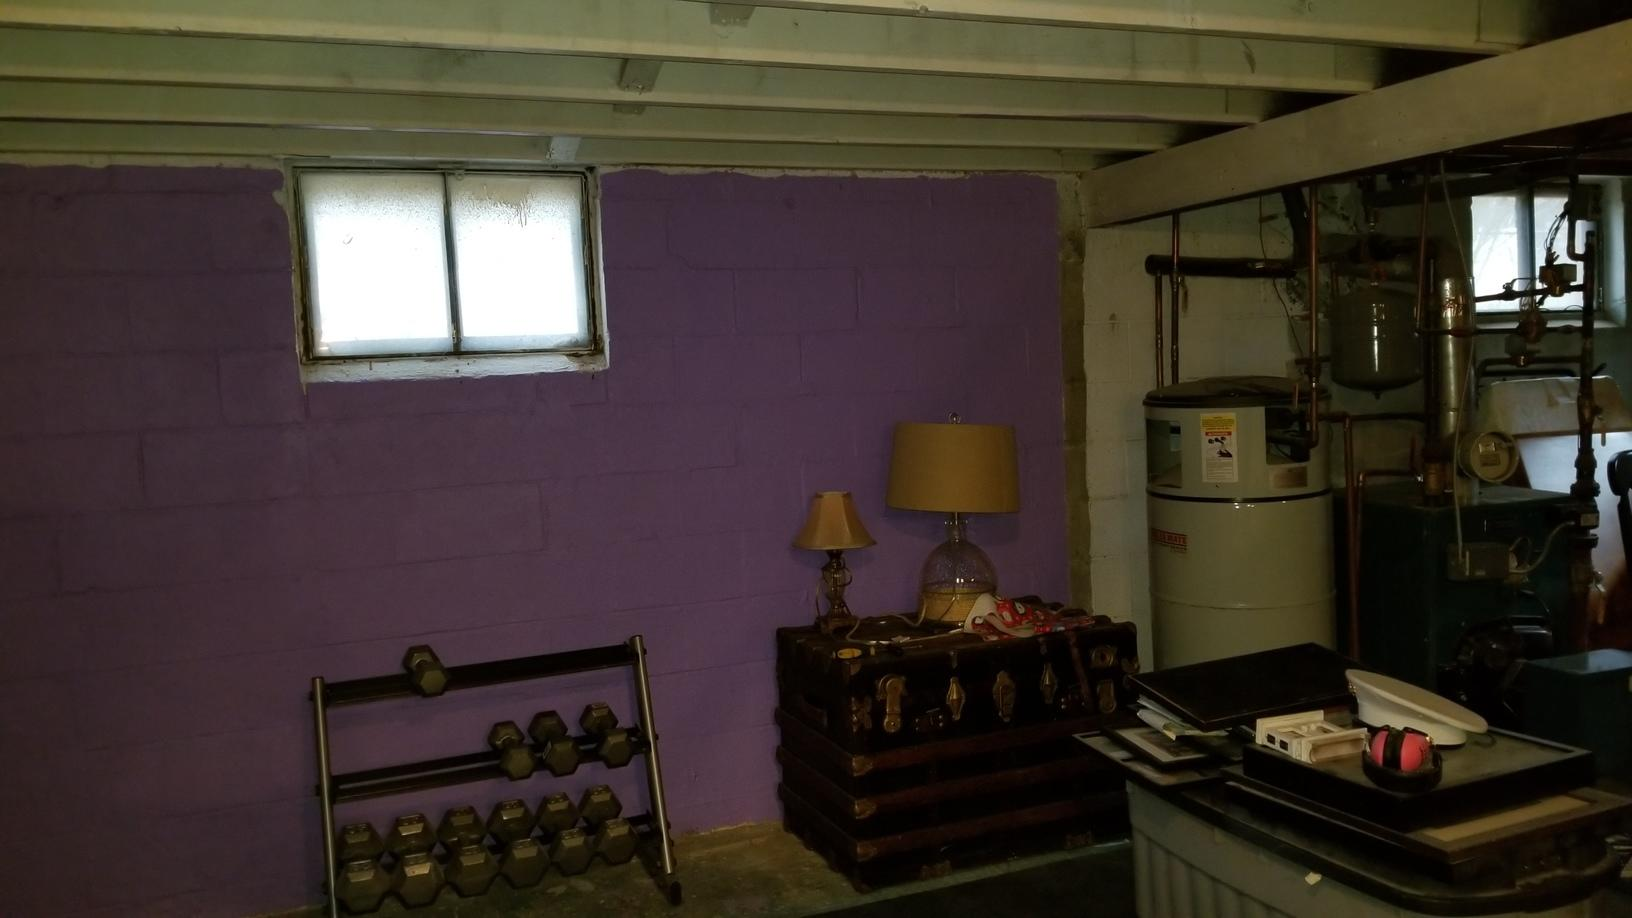 Finished Basement in Poughkeepsie, NY - Before Photo